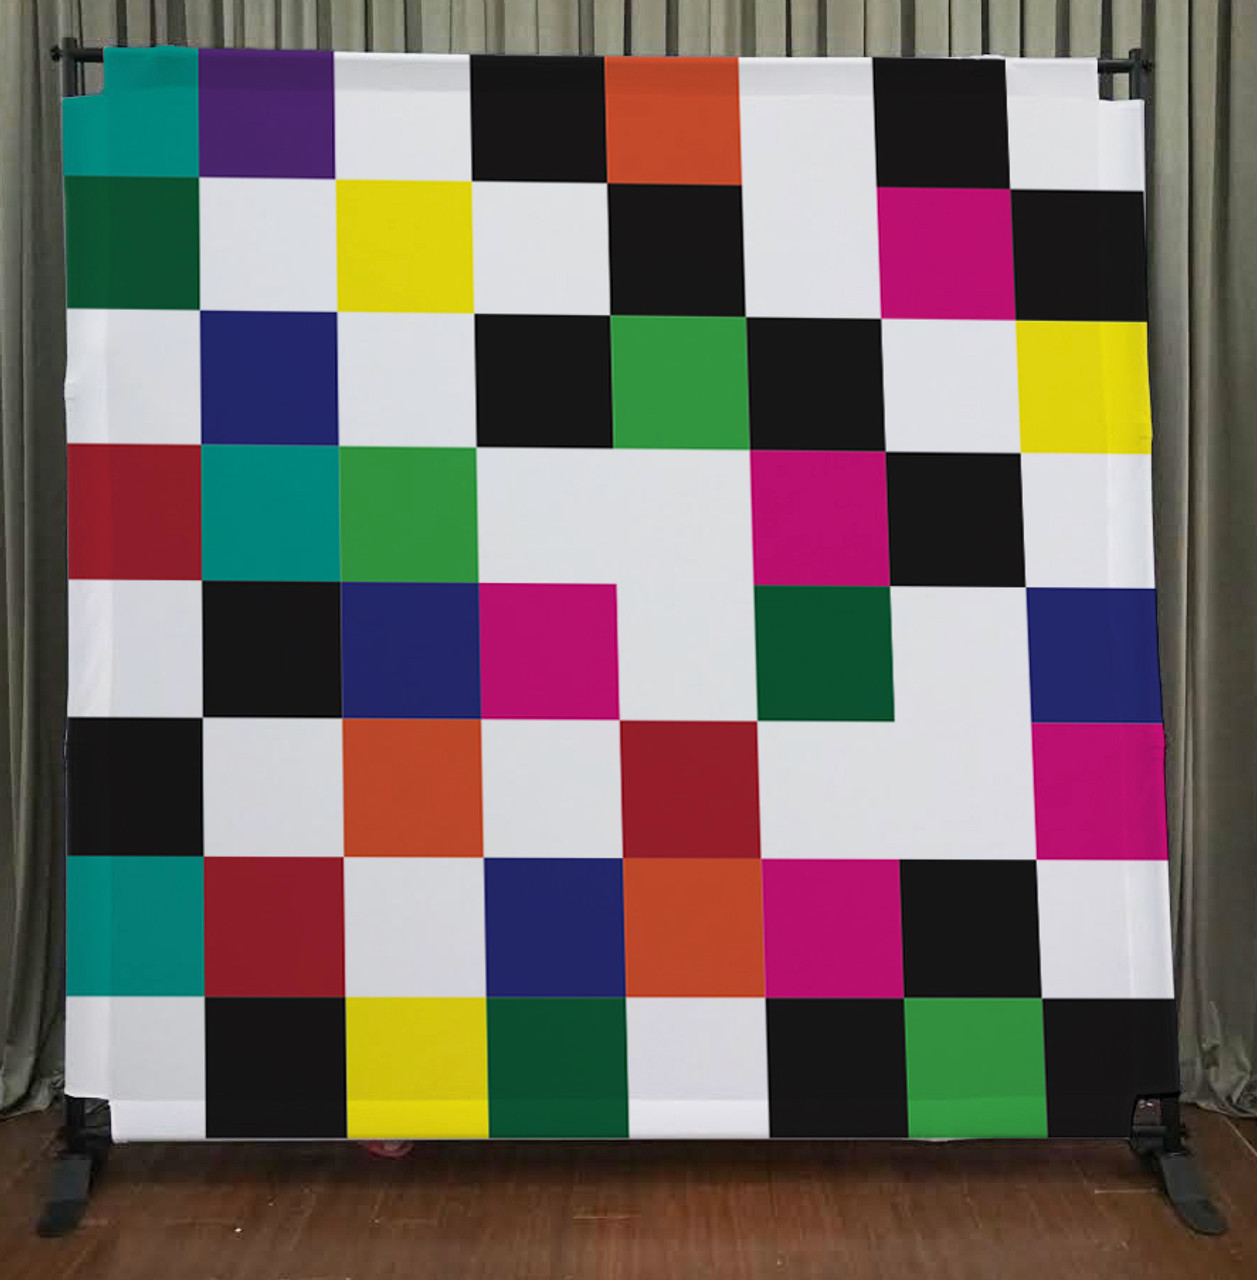 8x8 Printed Tension fabric backdrop (Colorful Checkers) - PB Backdrops